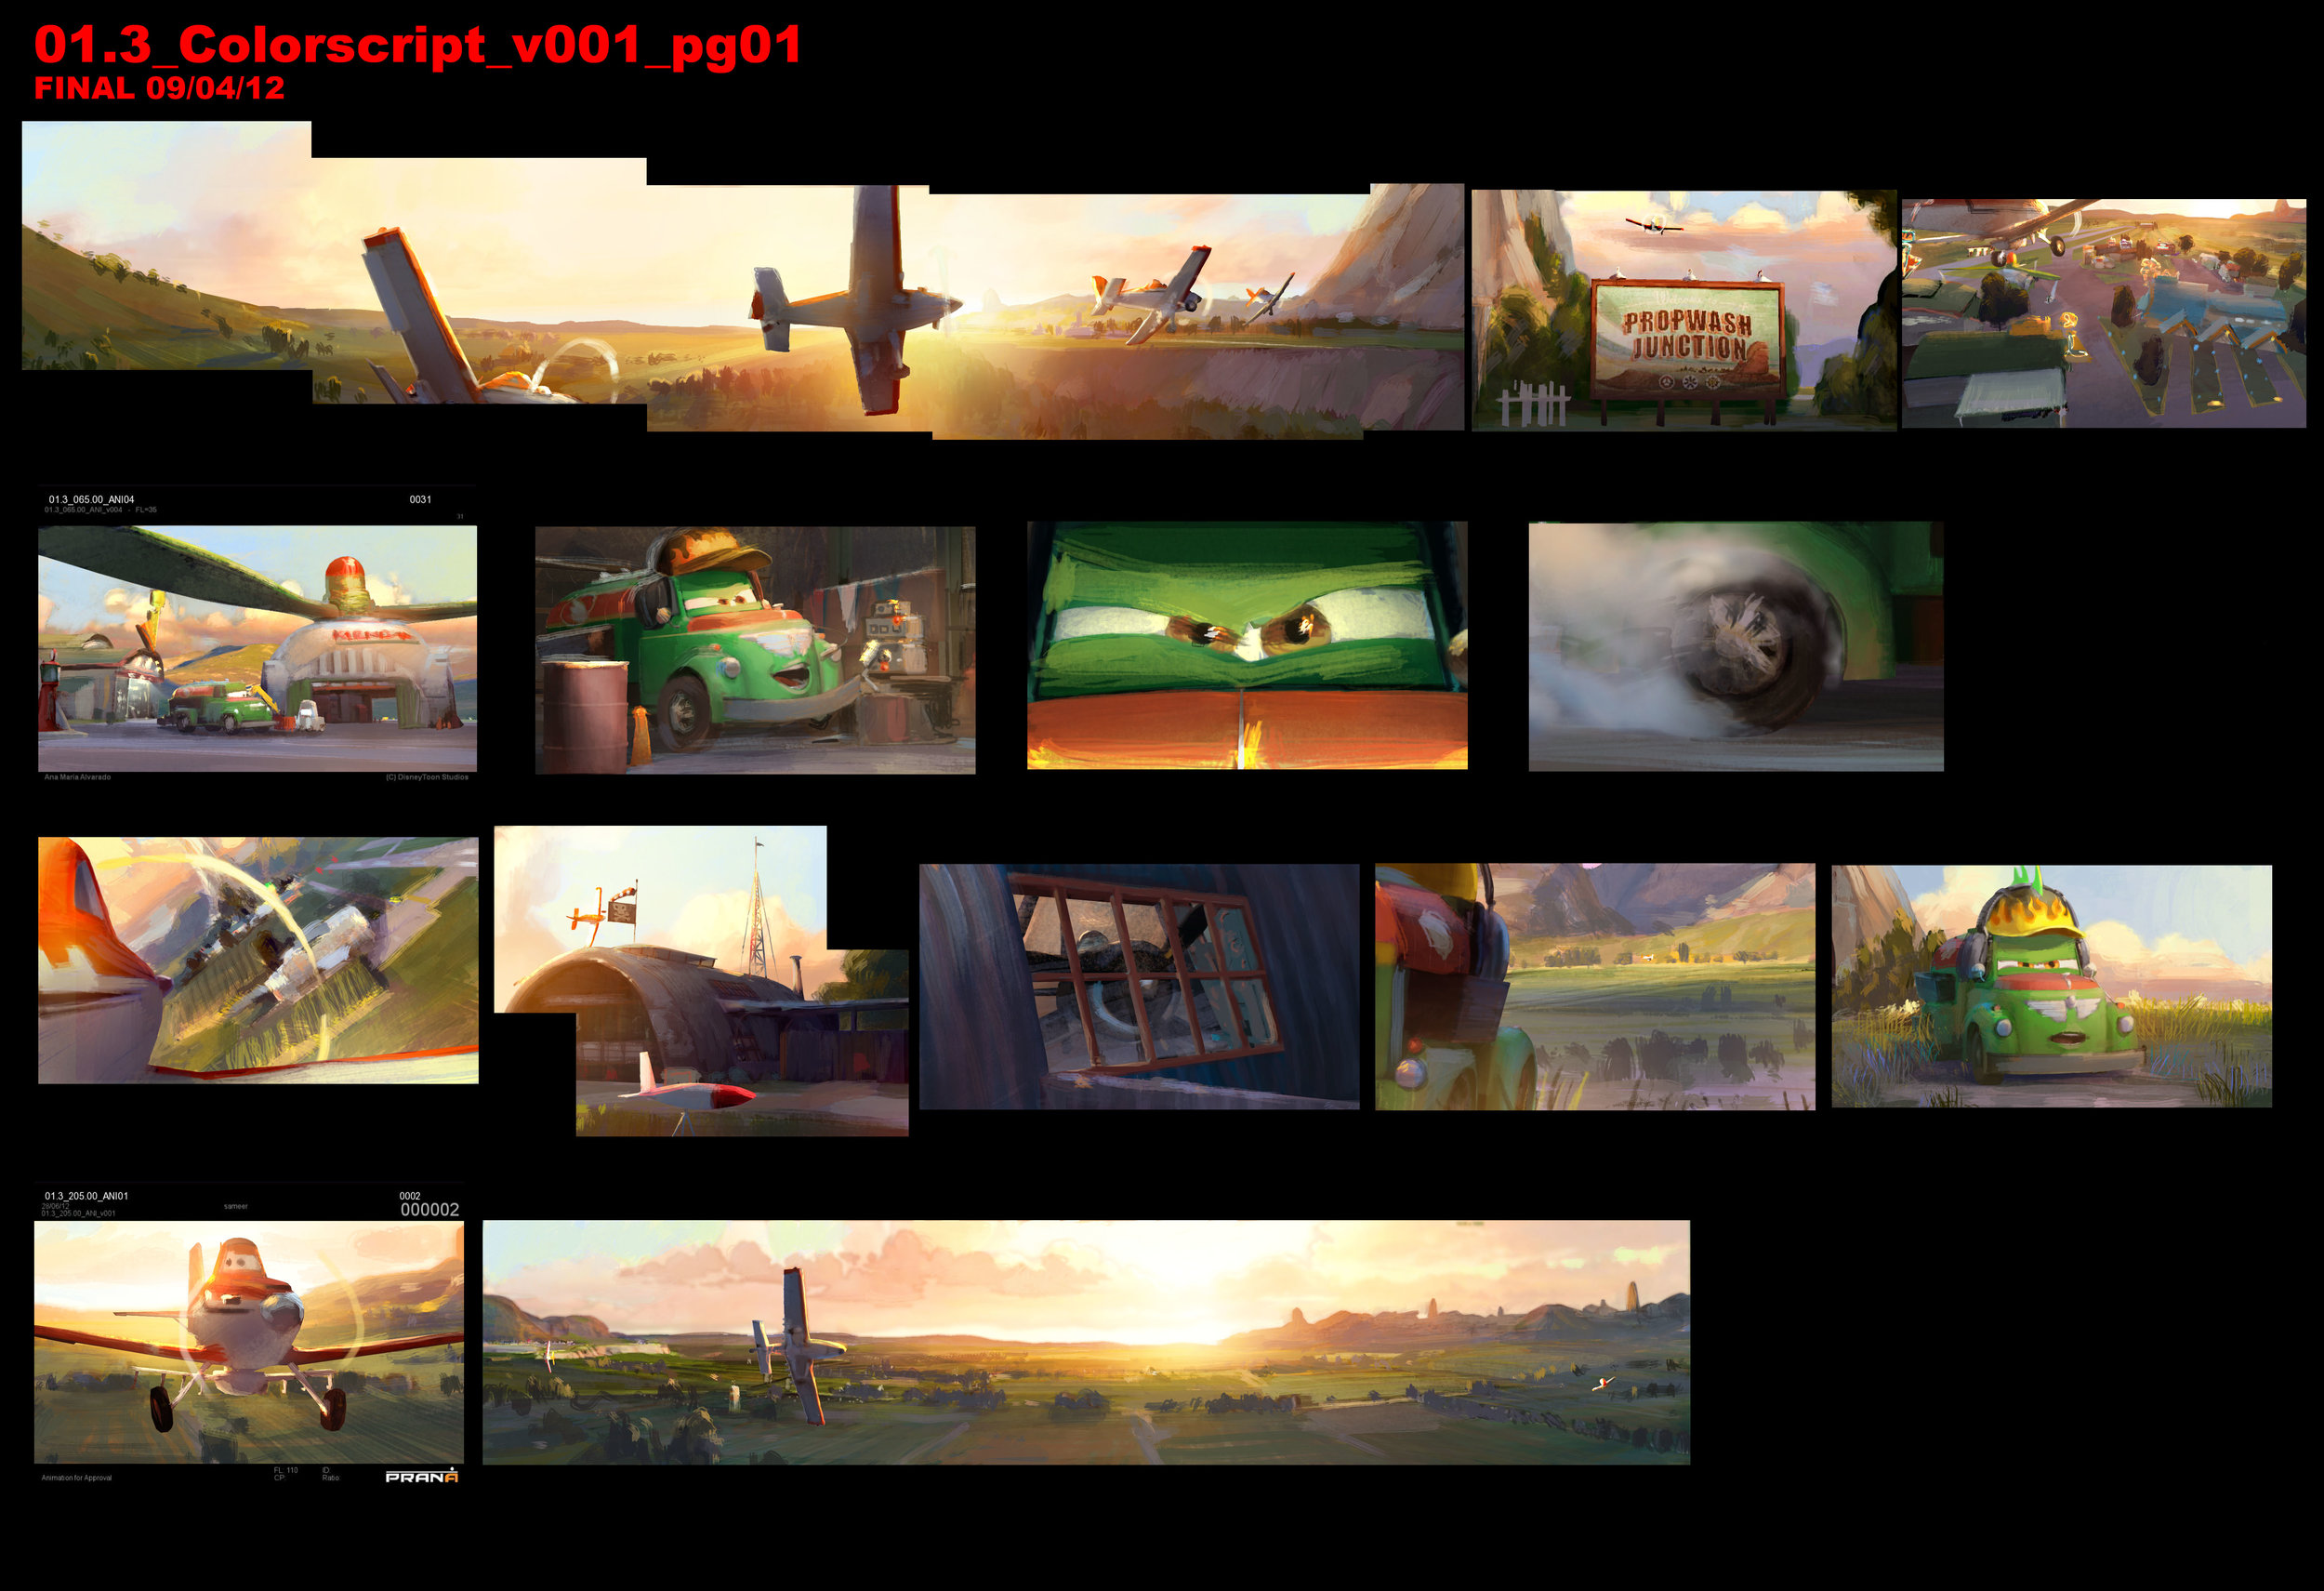 01.3_Colorscript_v002_pg01_FINAL.jpg